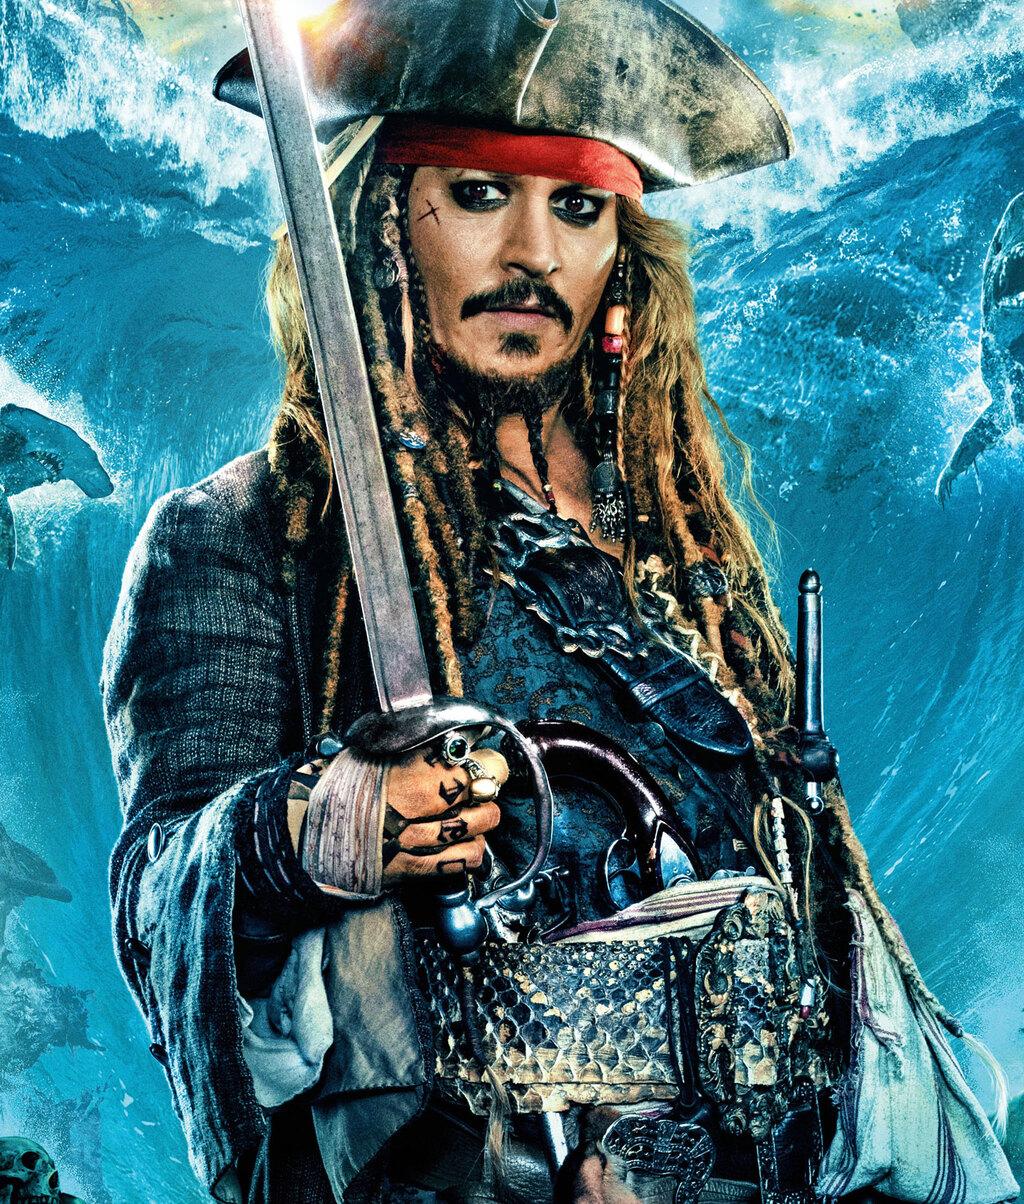 Pirates Of The Caribbean Wallpaper Hd: 1024x1204 Jack Sparrow In Pirates Of The Caribbean Dead